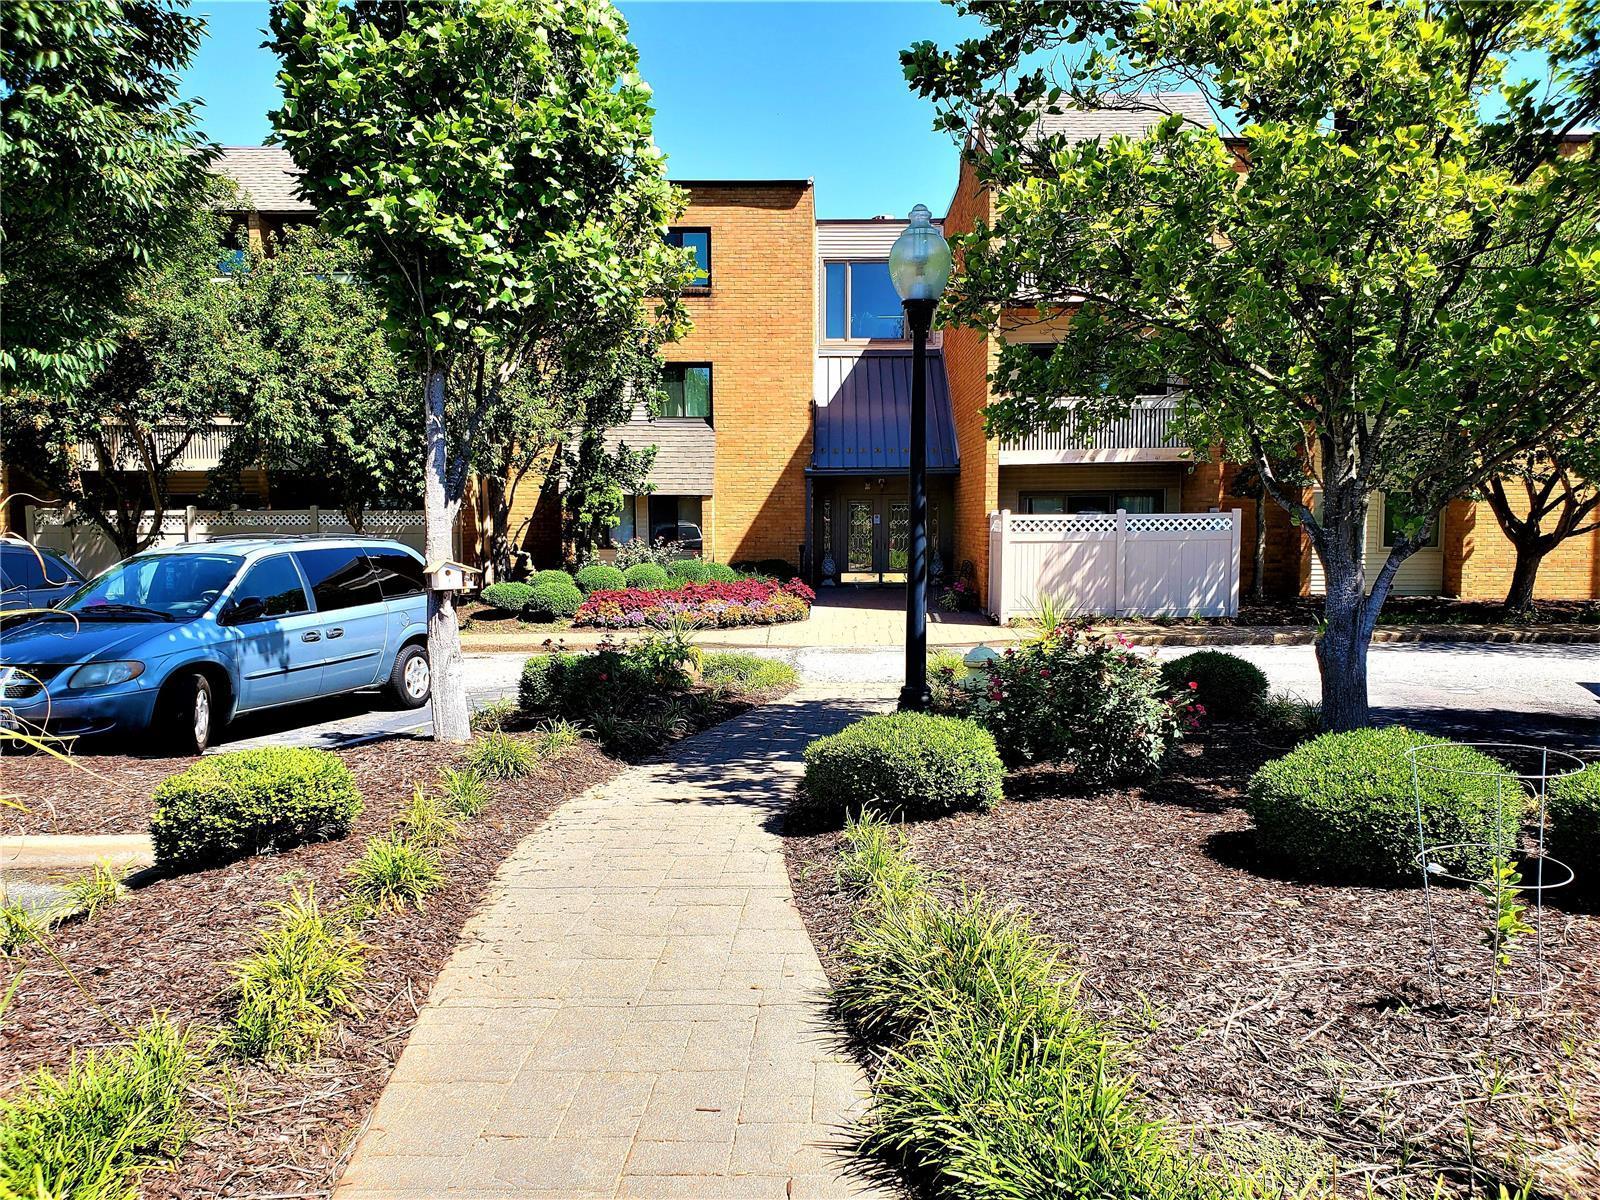 950 E Rue de la Banque #113 Property Photo - Creve Coeur, MO real estate listing